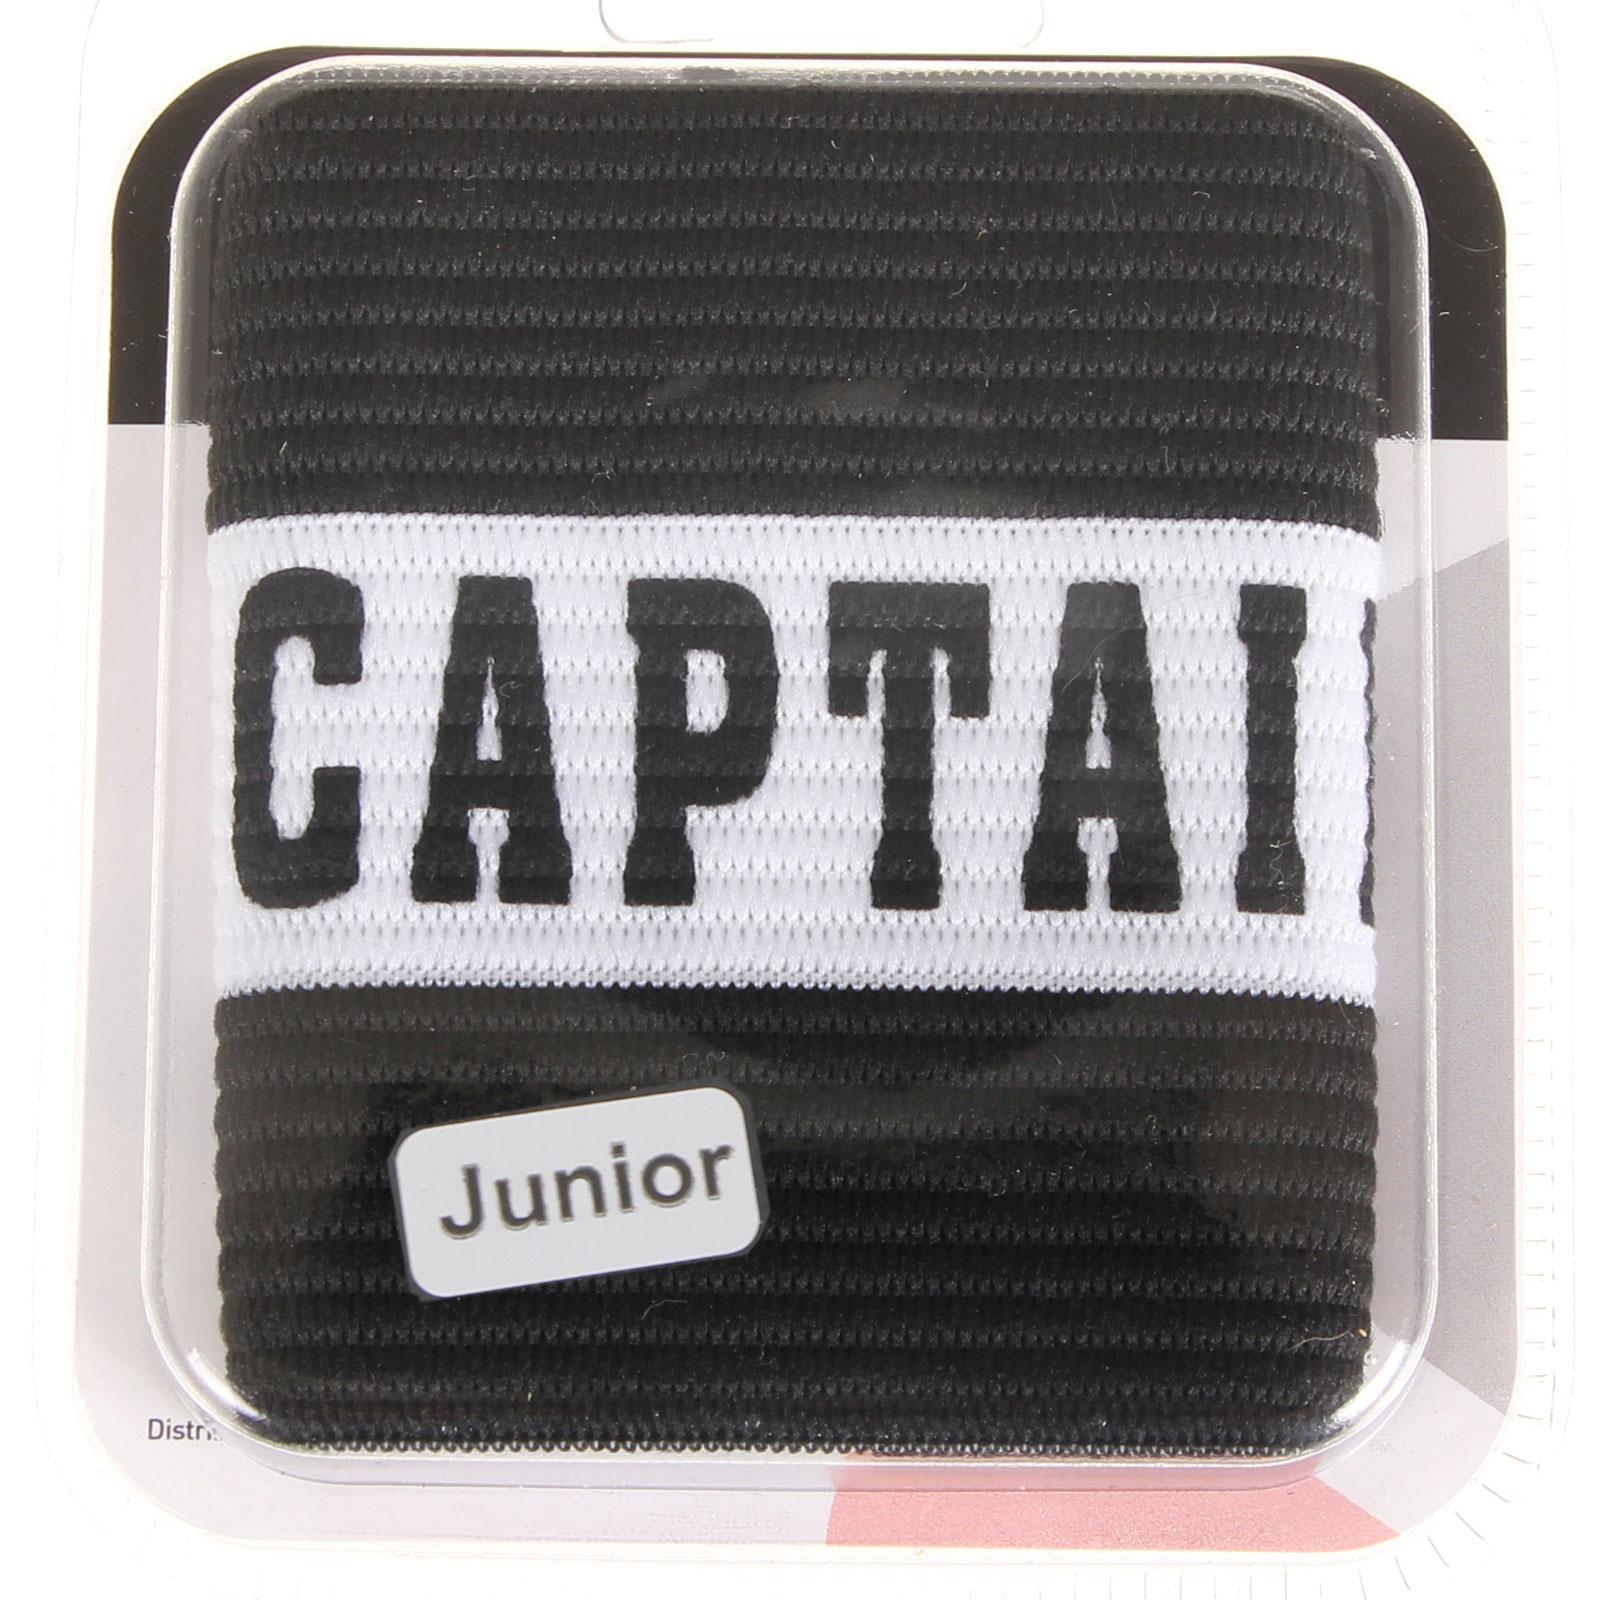 Precision-Training-Football-Captains-Arm-Band-Junior-rrp-6